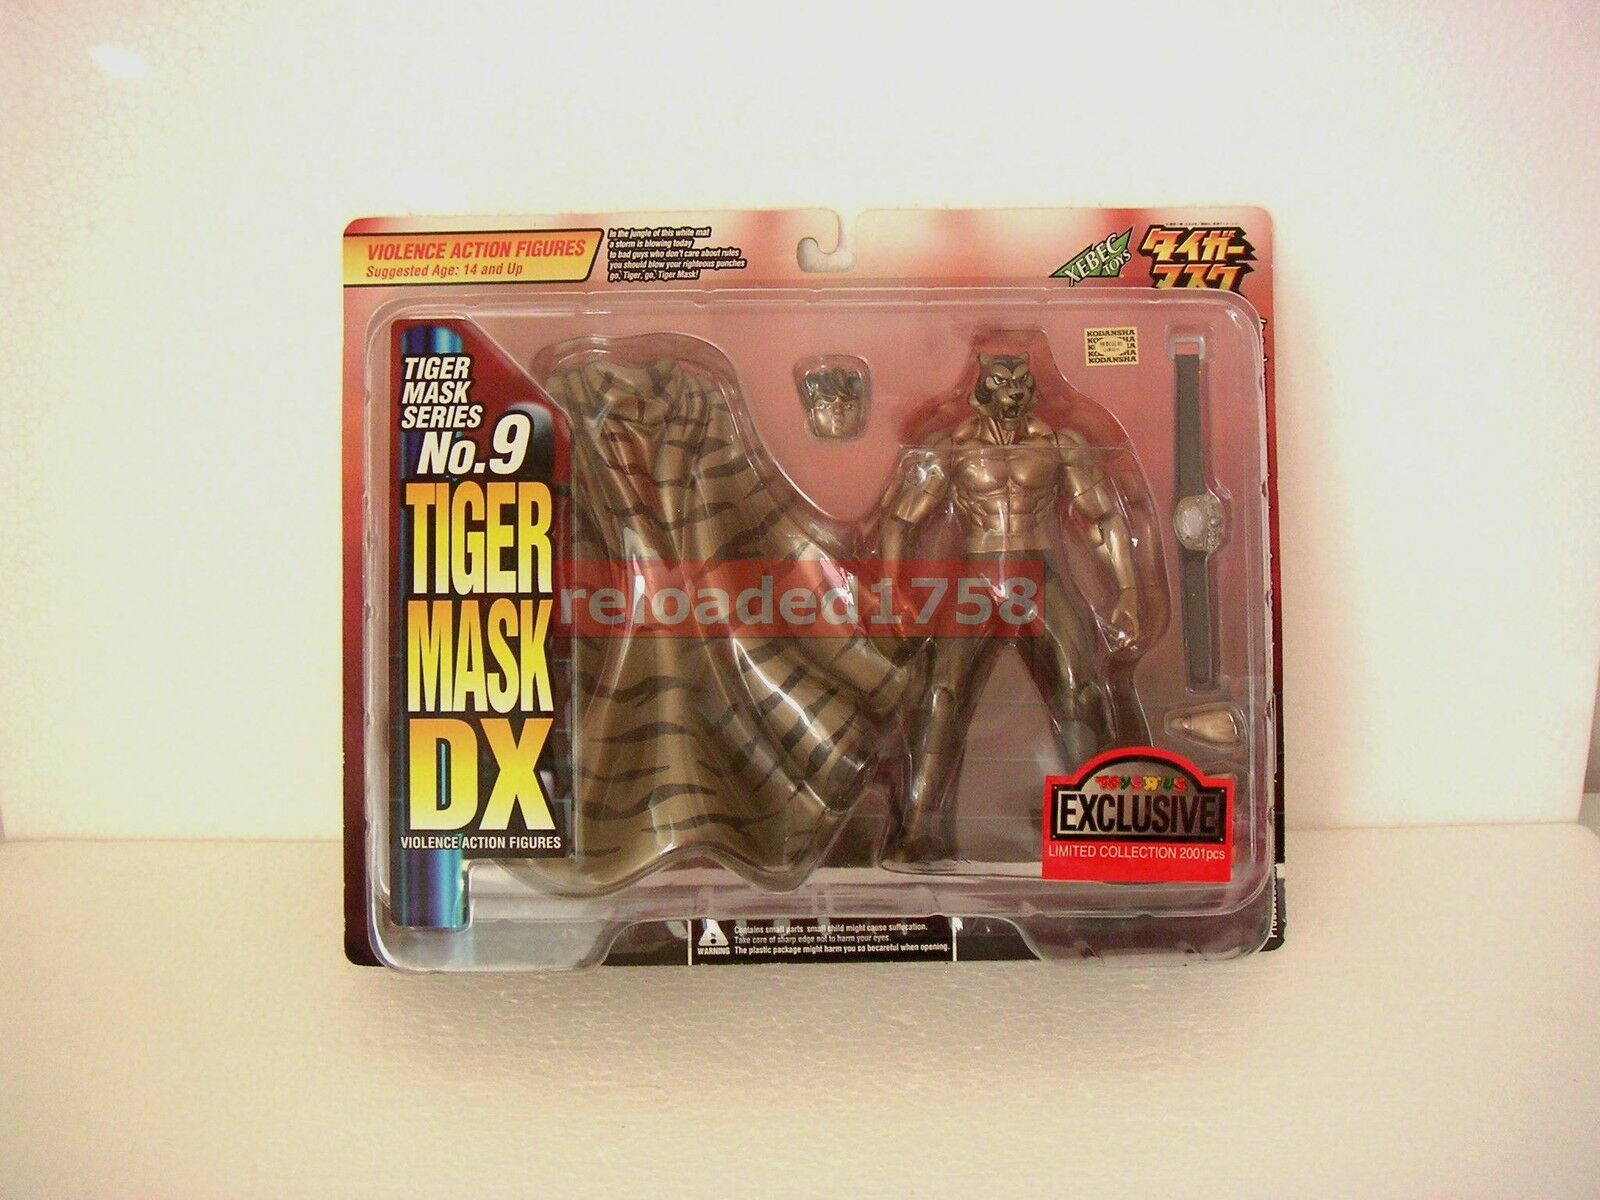 TIGER MAN MASK DX TOYS R US UOMO TIGRE KAIYODO  9 LIMITED COLLECTION 2001 PCS